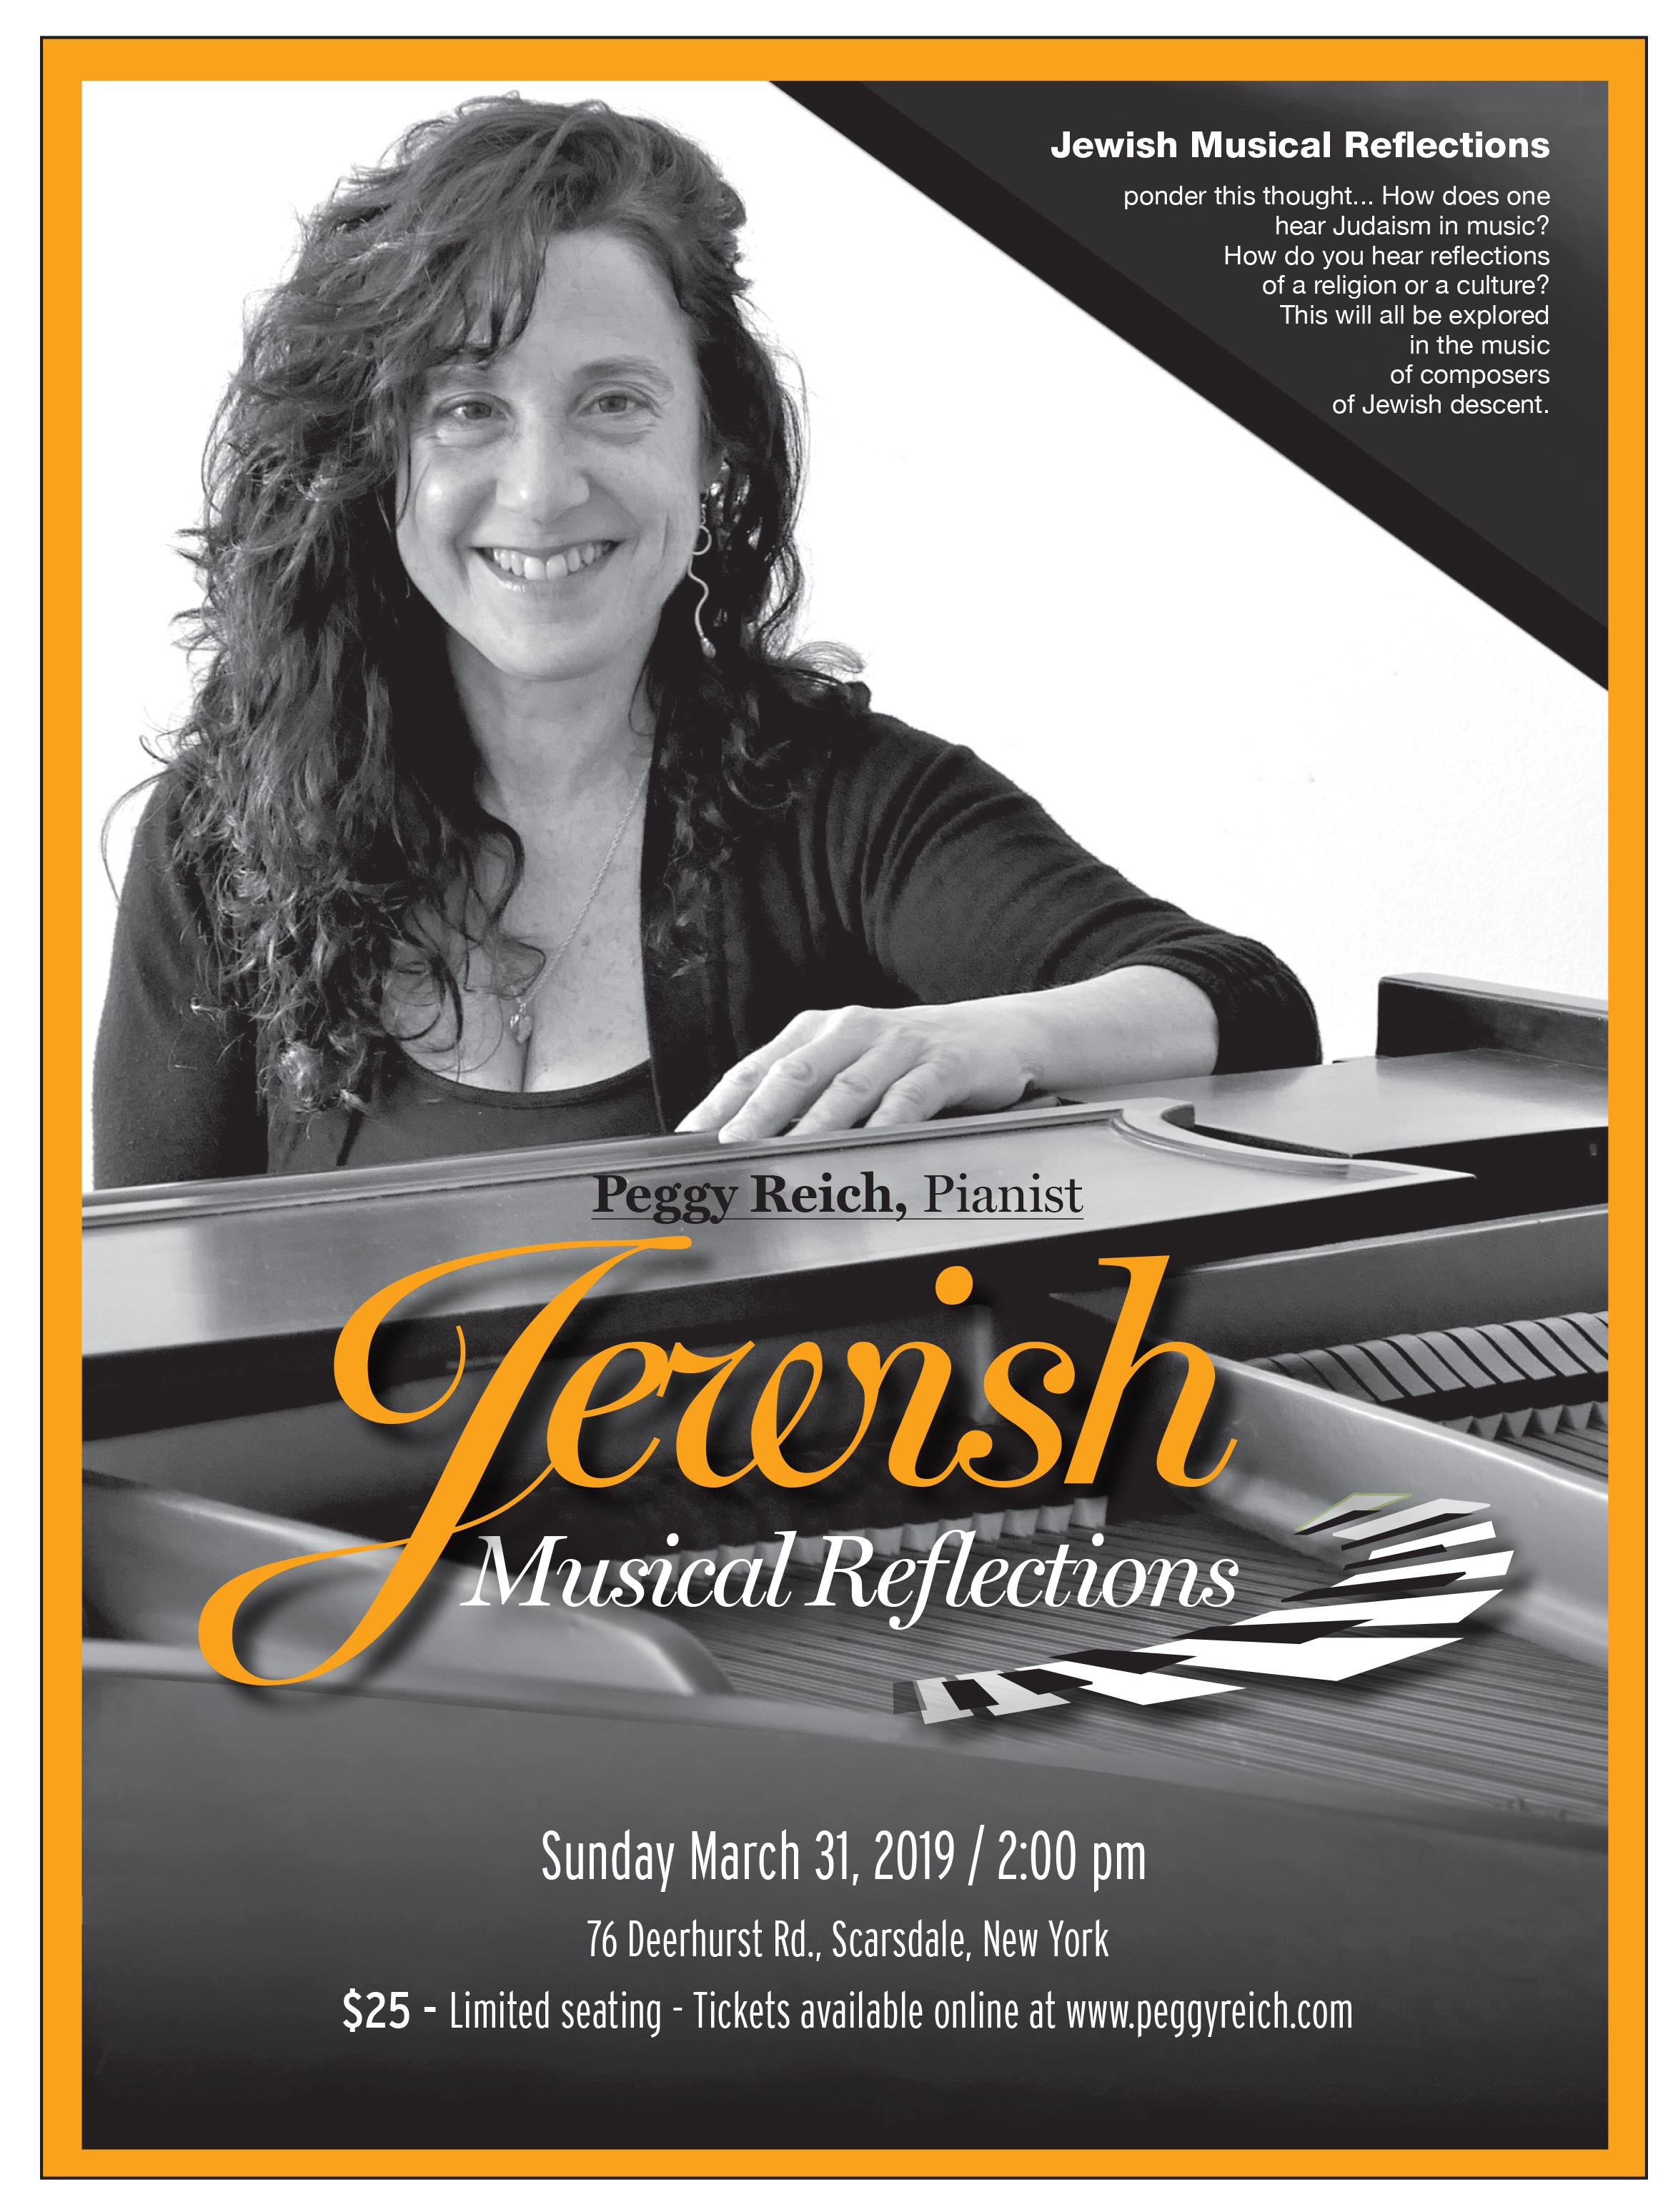 Jewish Reflections 2019 Newlast.jpg